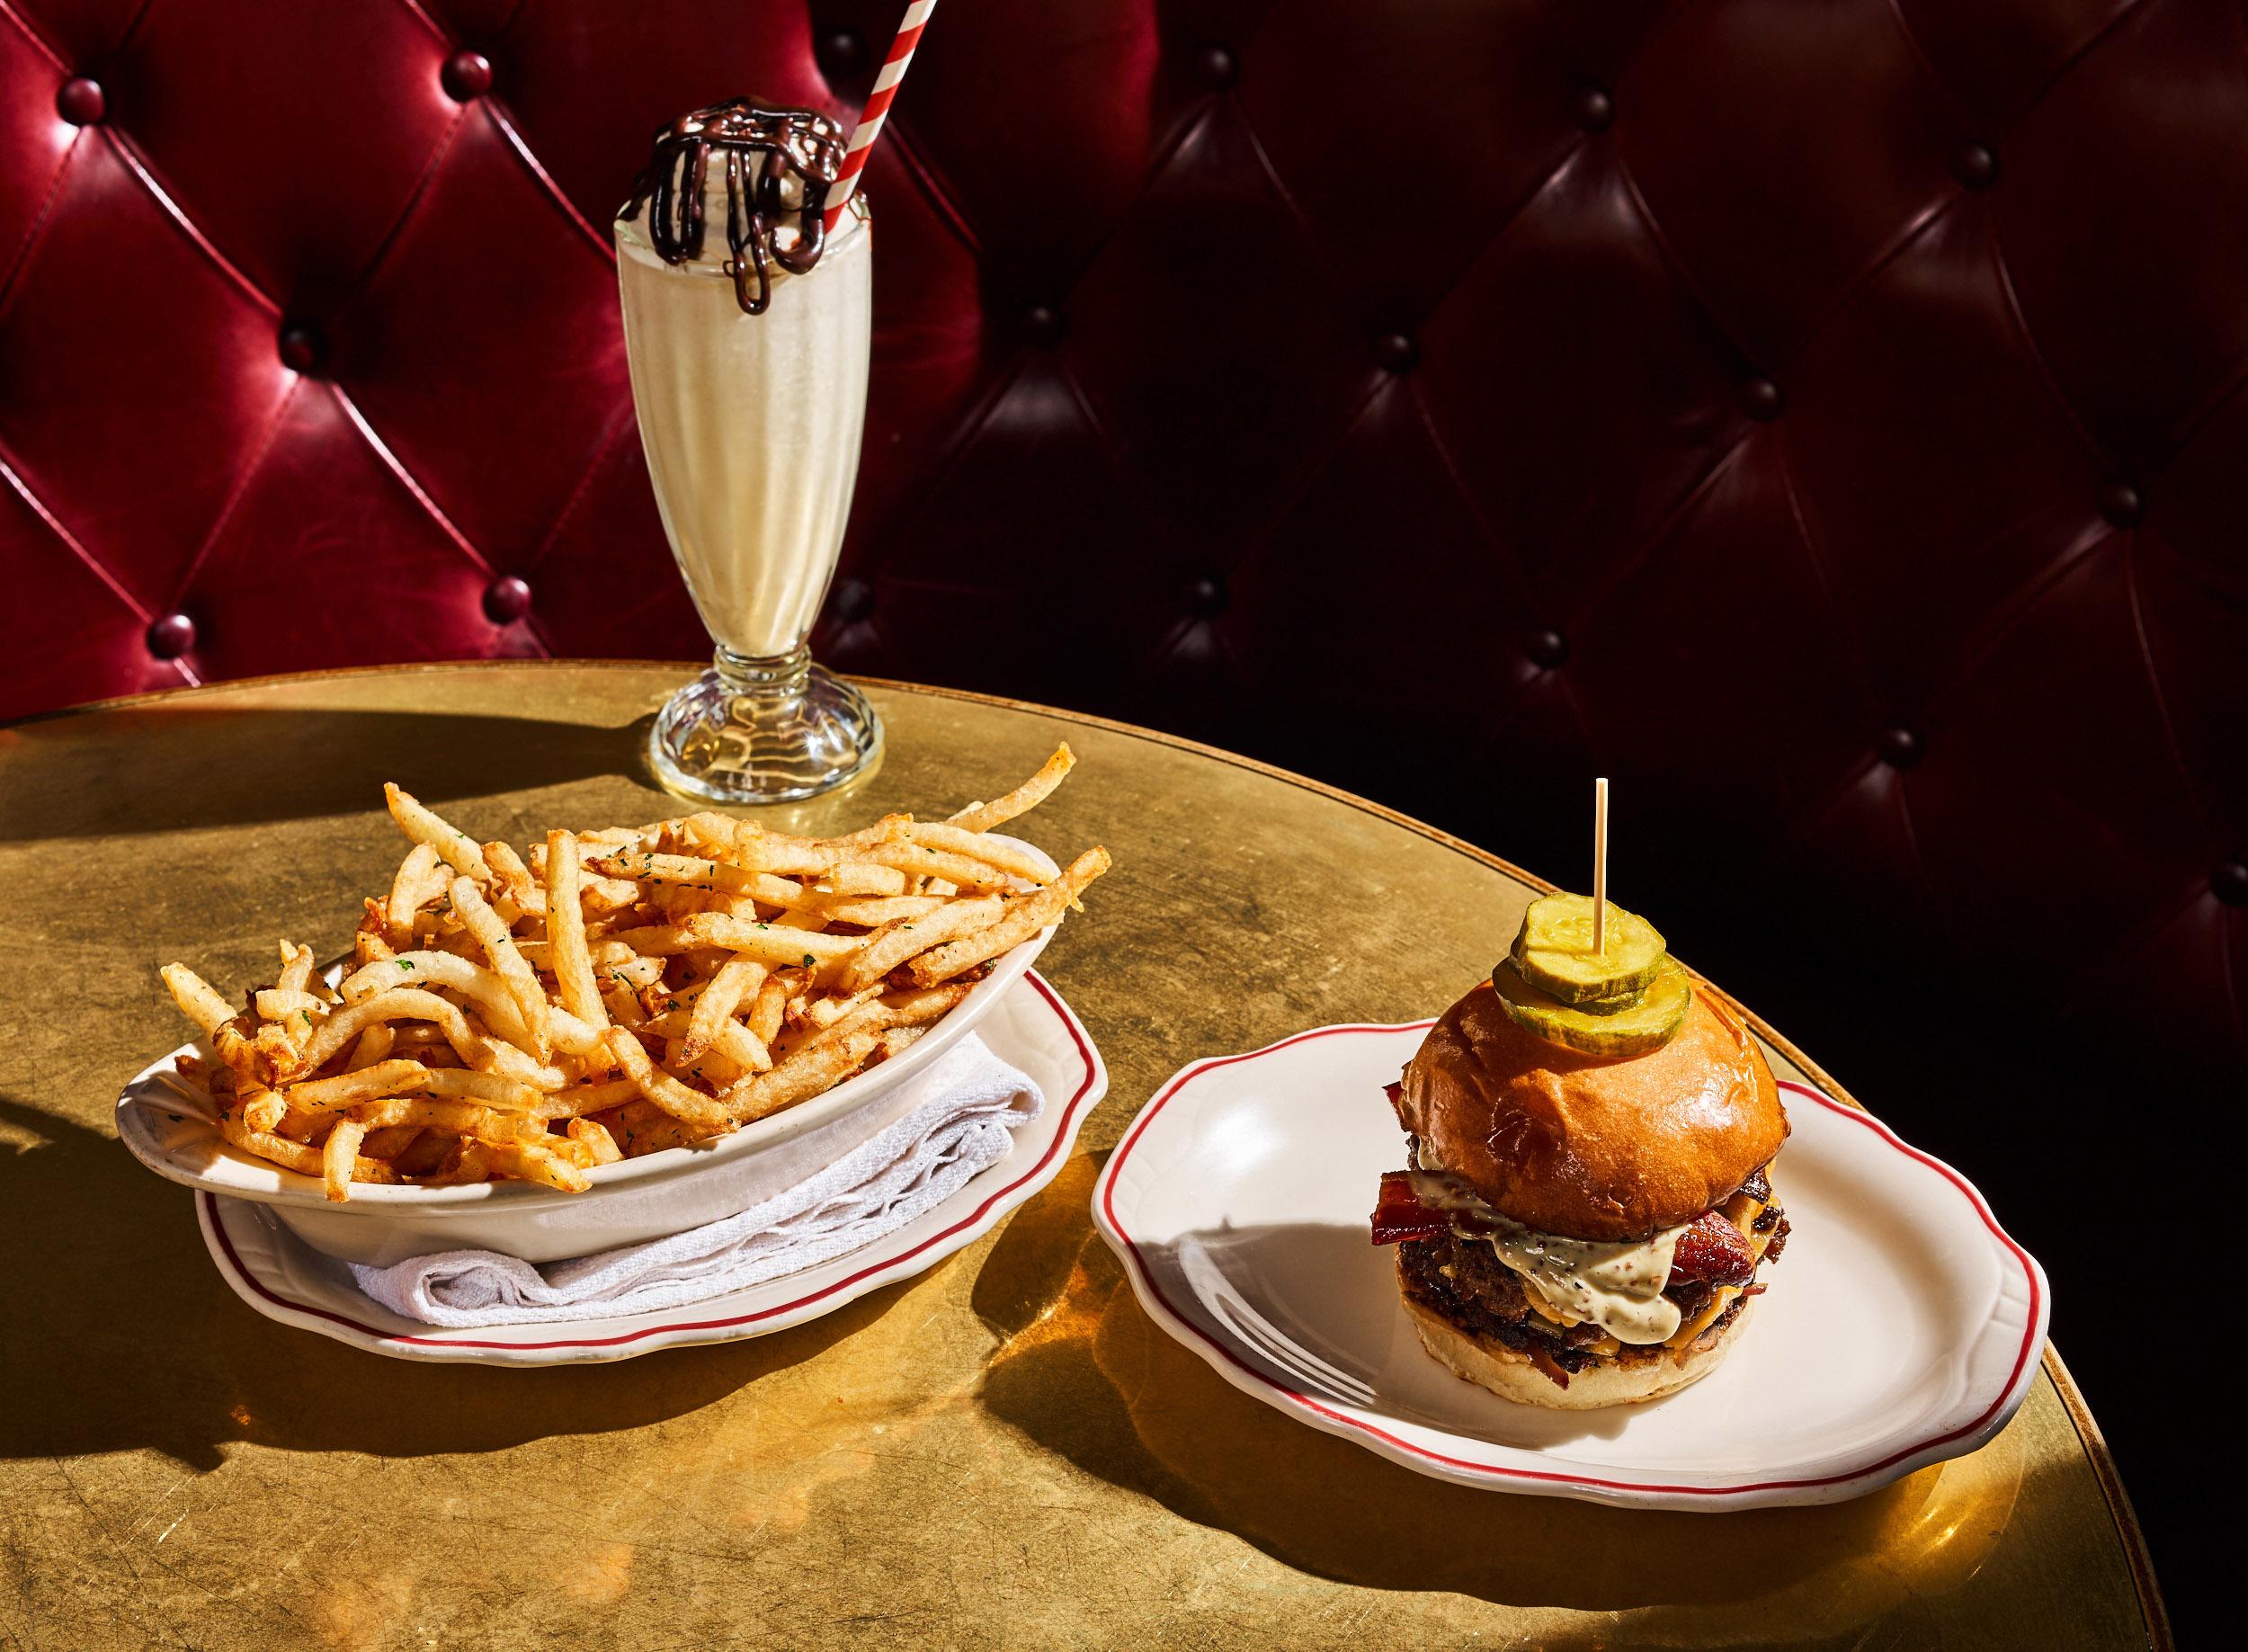 The Marcel burger, fries, and boozy milkshake